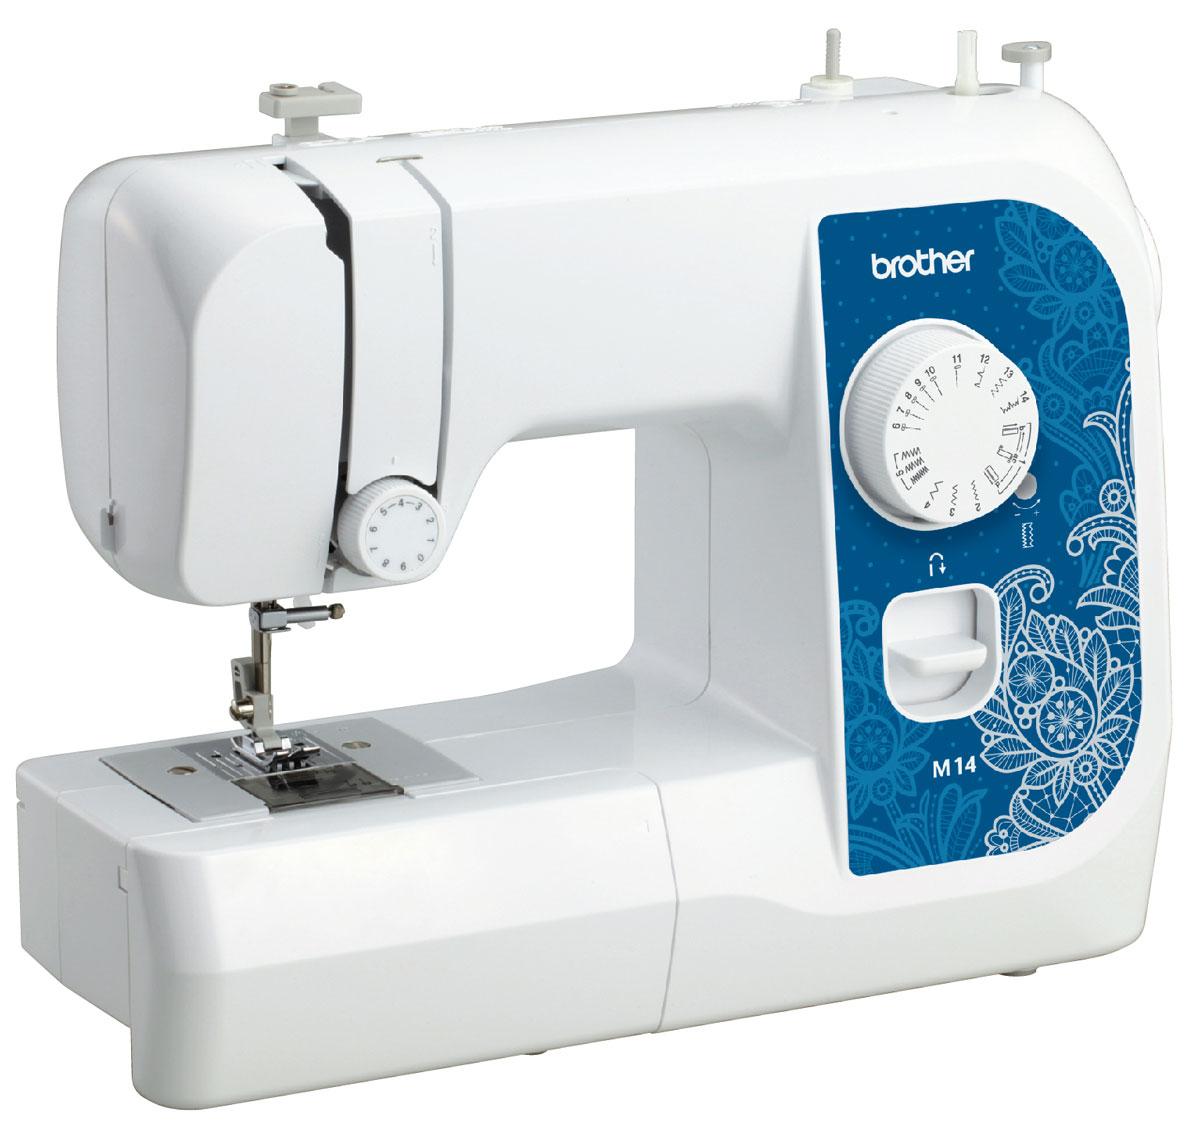 Brother M14 швейная машина